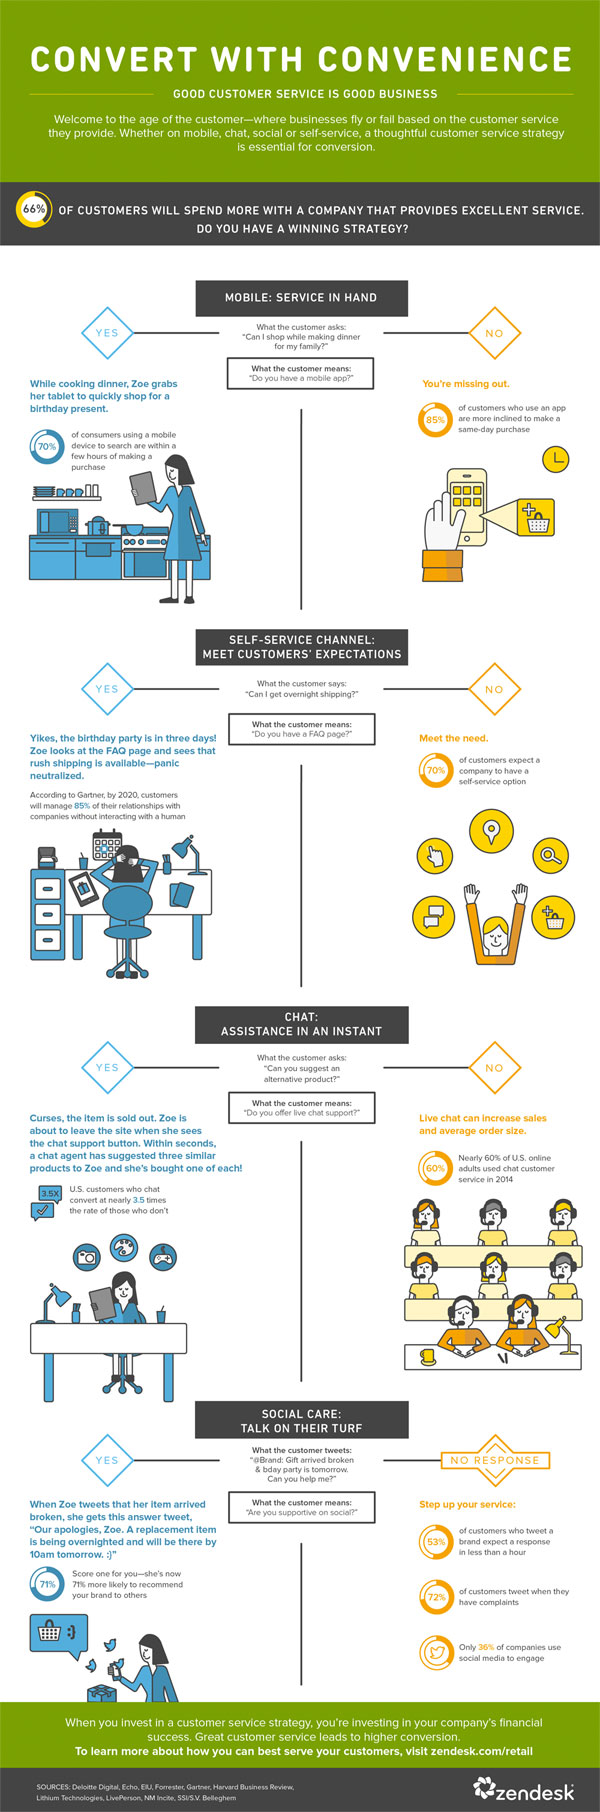 omnichannel-customer-service-infographic